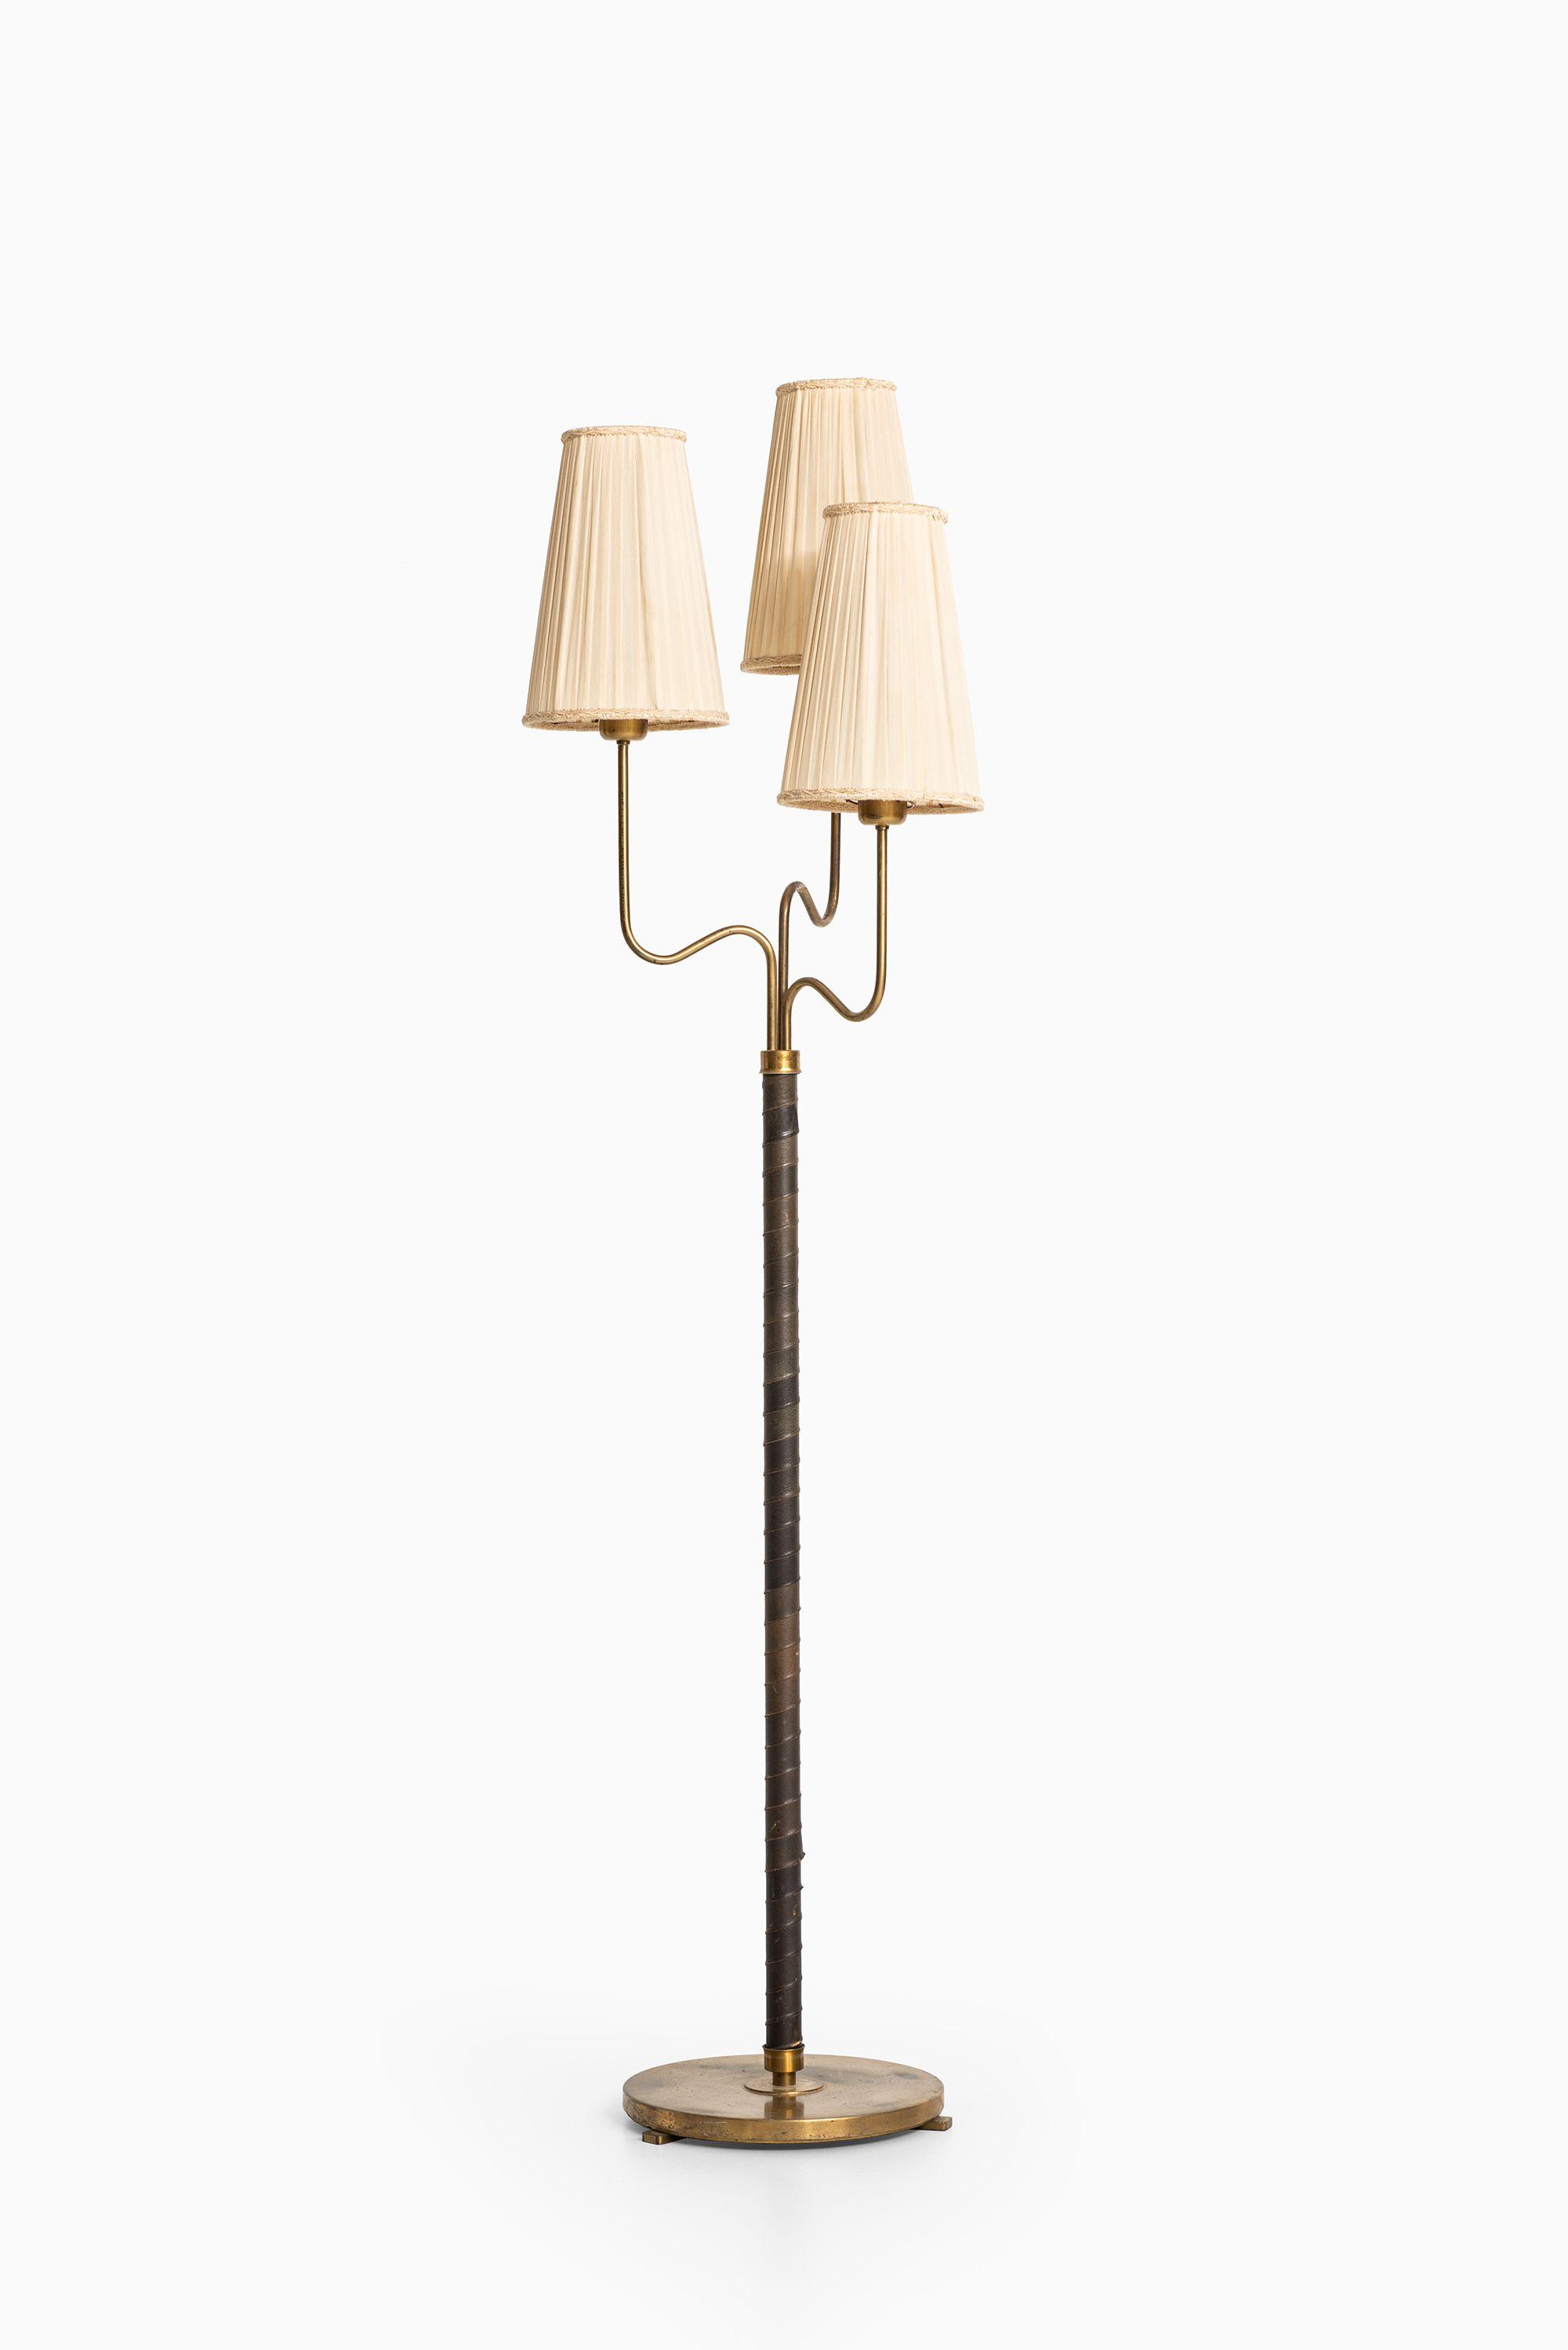 Hans Bergstrom Floor Lamp Studio Schalling Lamp Floor Lamp Lampshade Designs